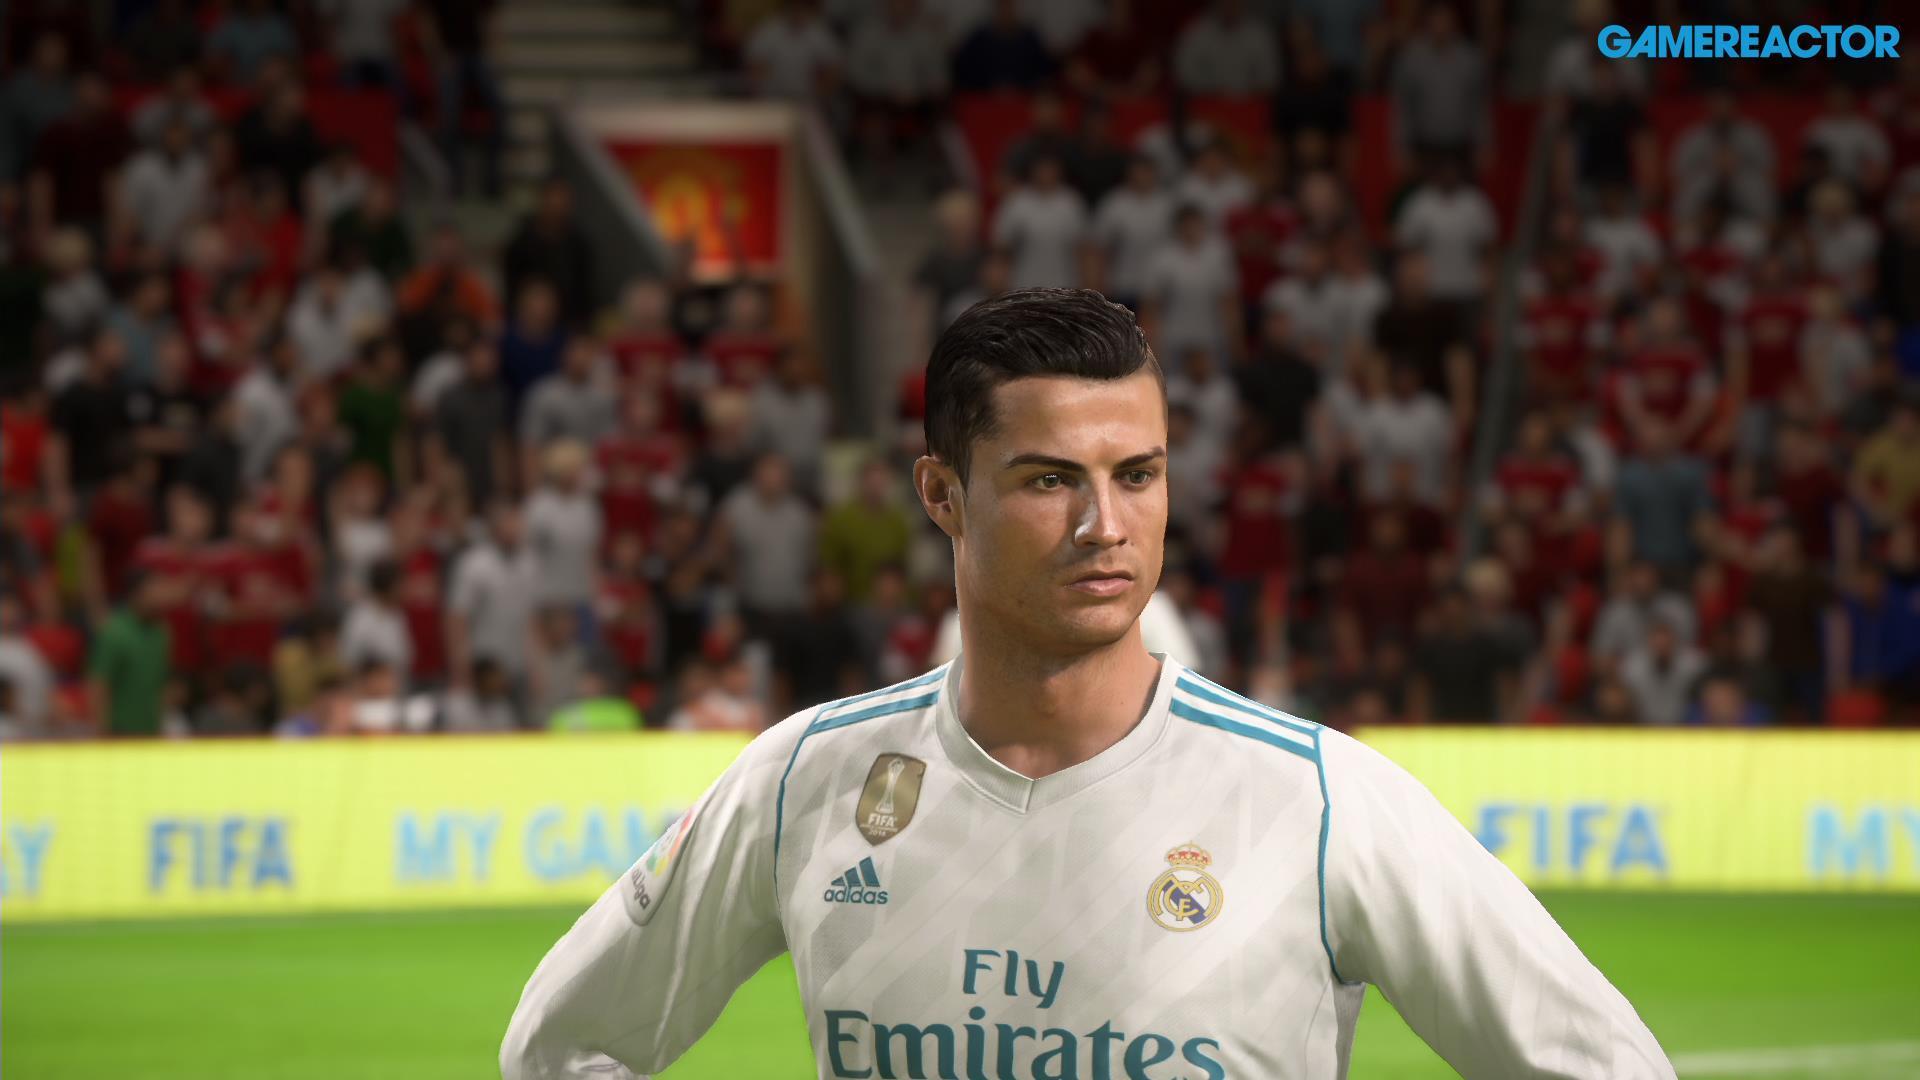 New FIFA 18 Update Patch To Fix The Kick Off Glitch